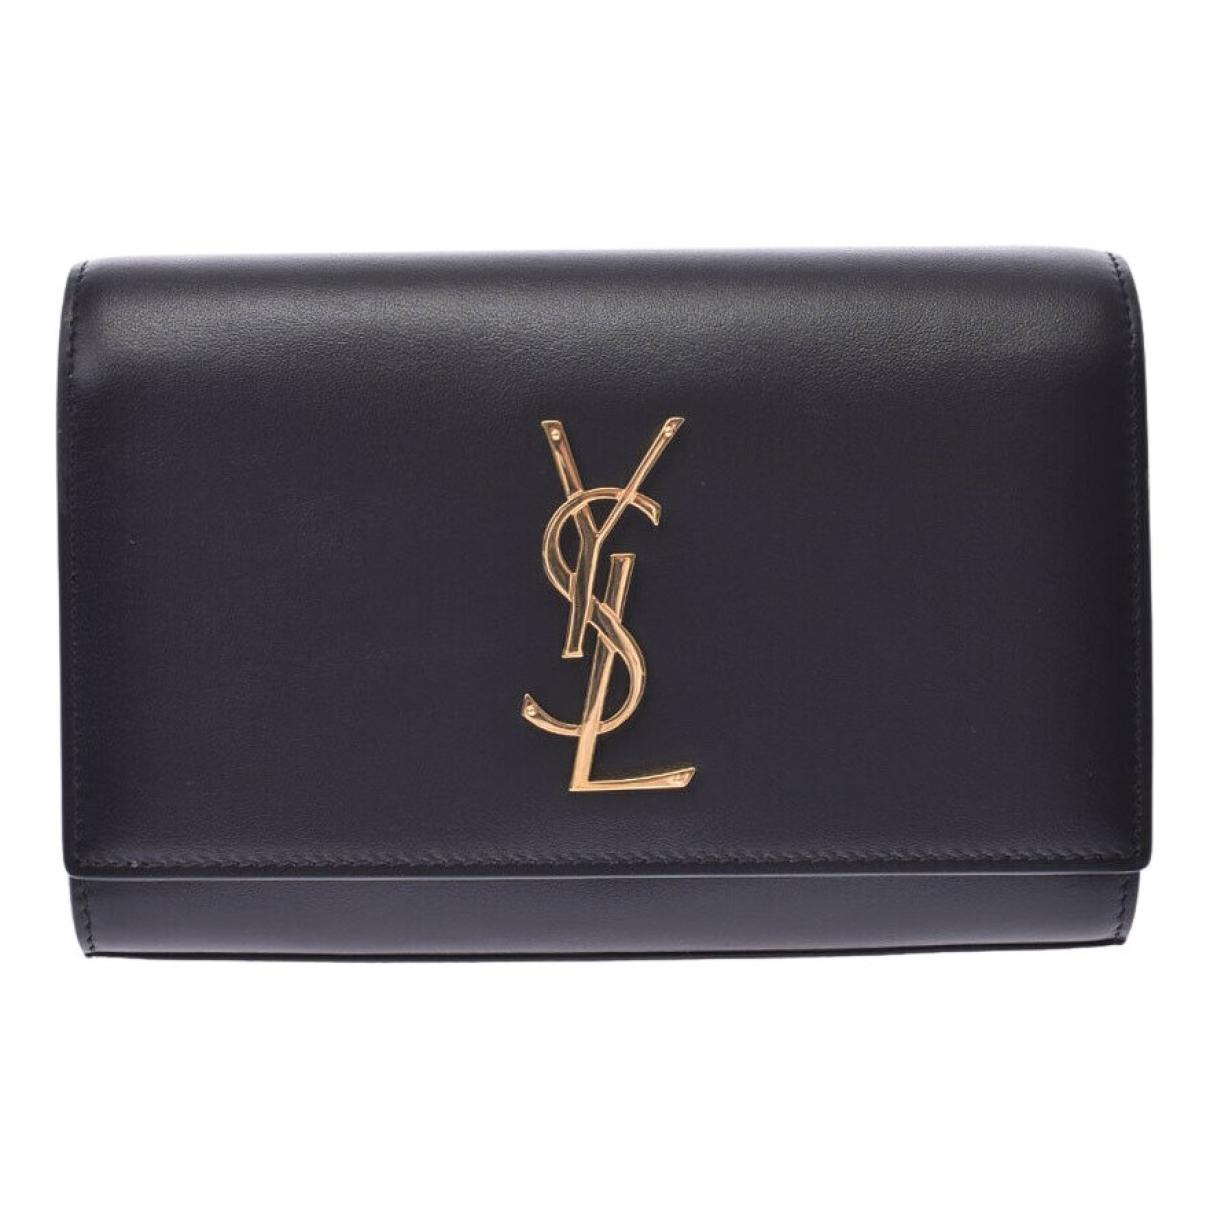 Saint Laurent Kate monogramme Black Leather Clutch bag for Women N